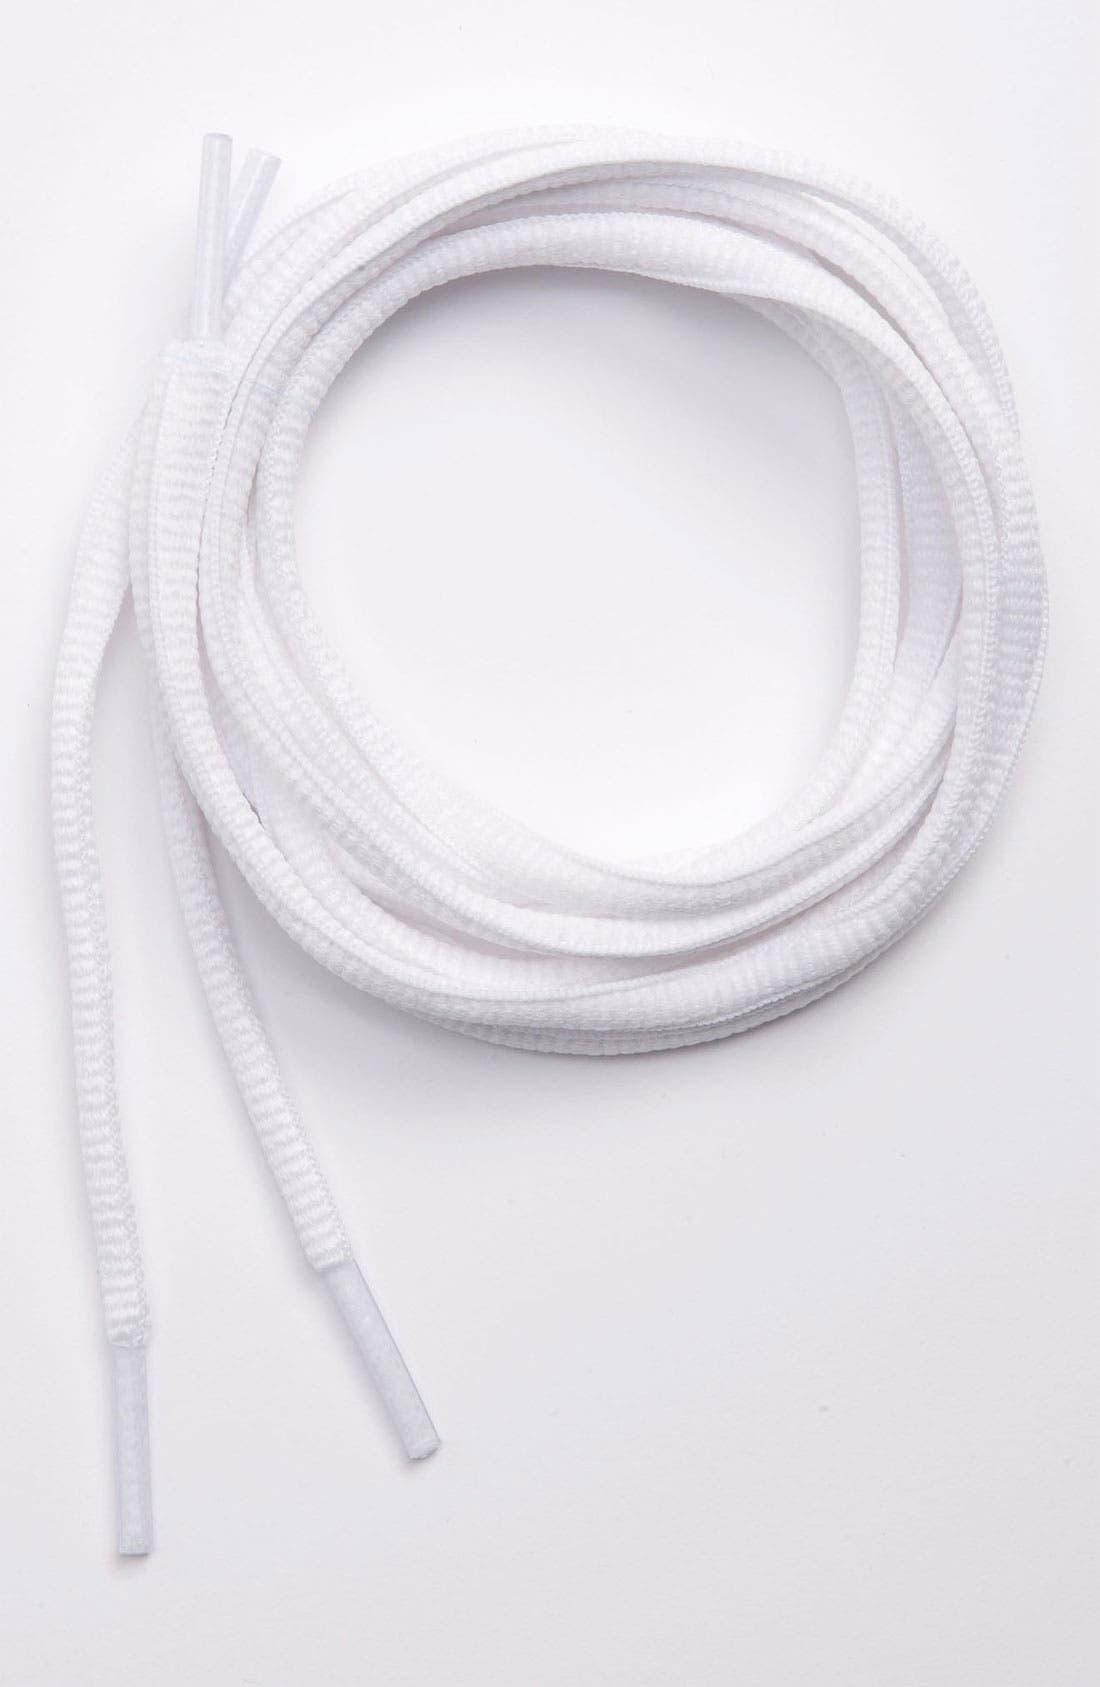 Alternate Image 1 Selected - Nordstrom 'Oval' Shoelaces (Little Kid & Big Kid)